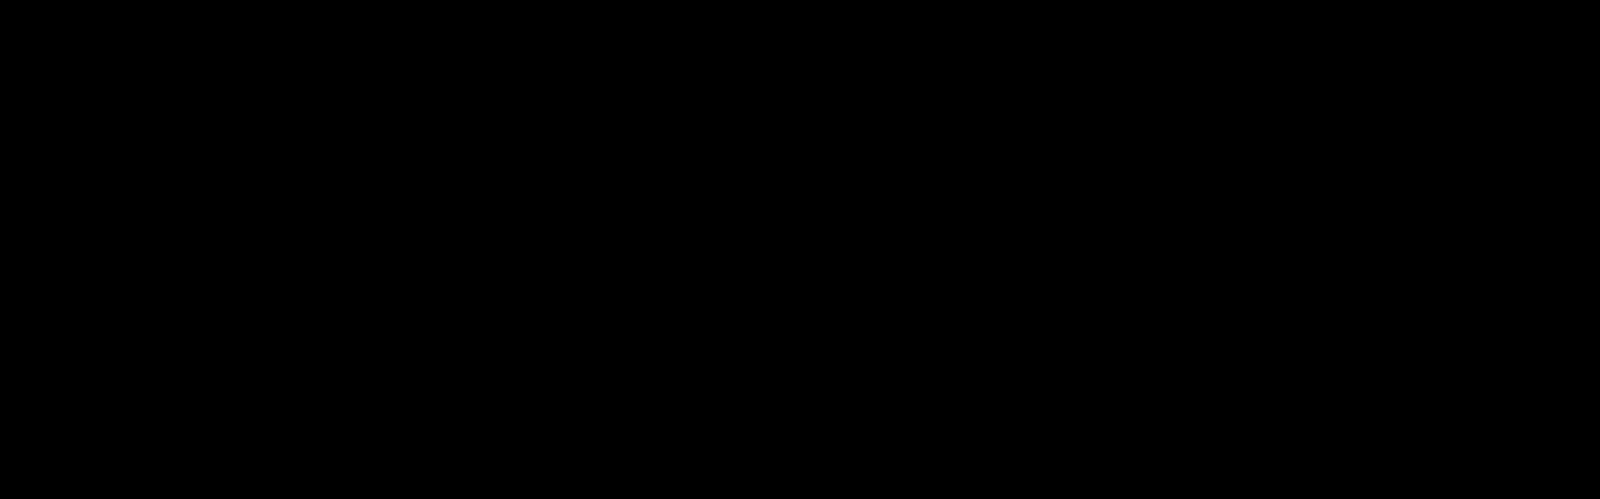 simple swirl clipart - 1600×499